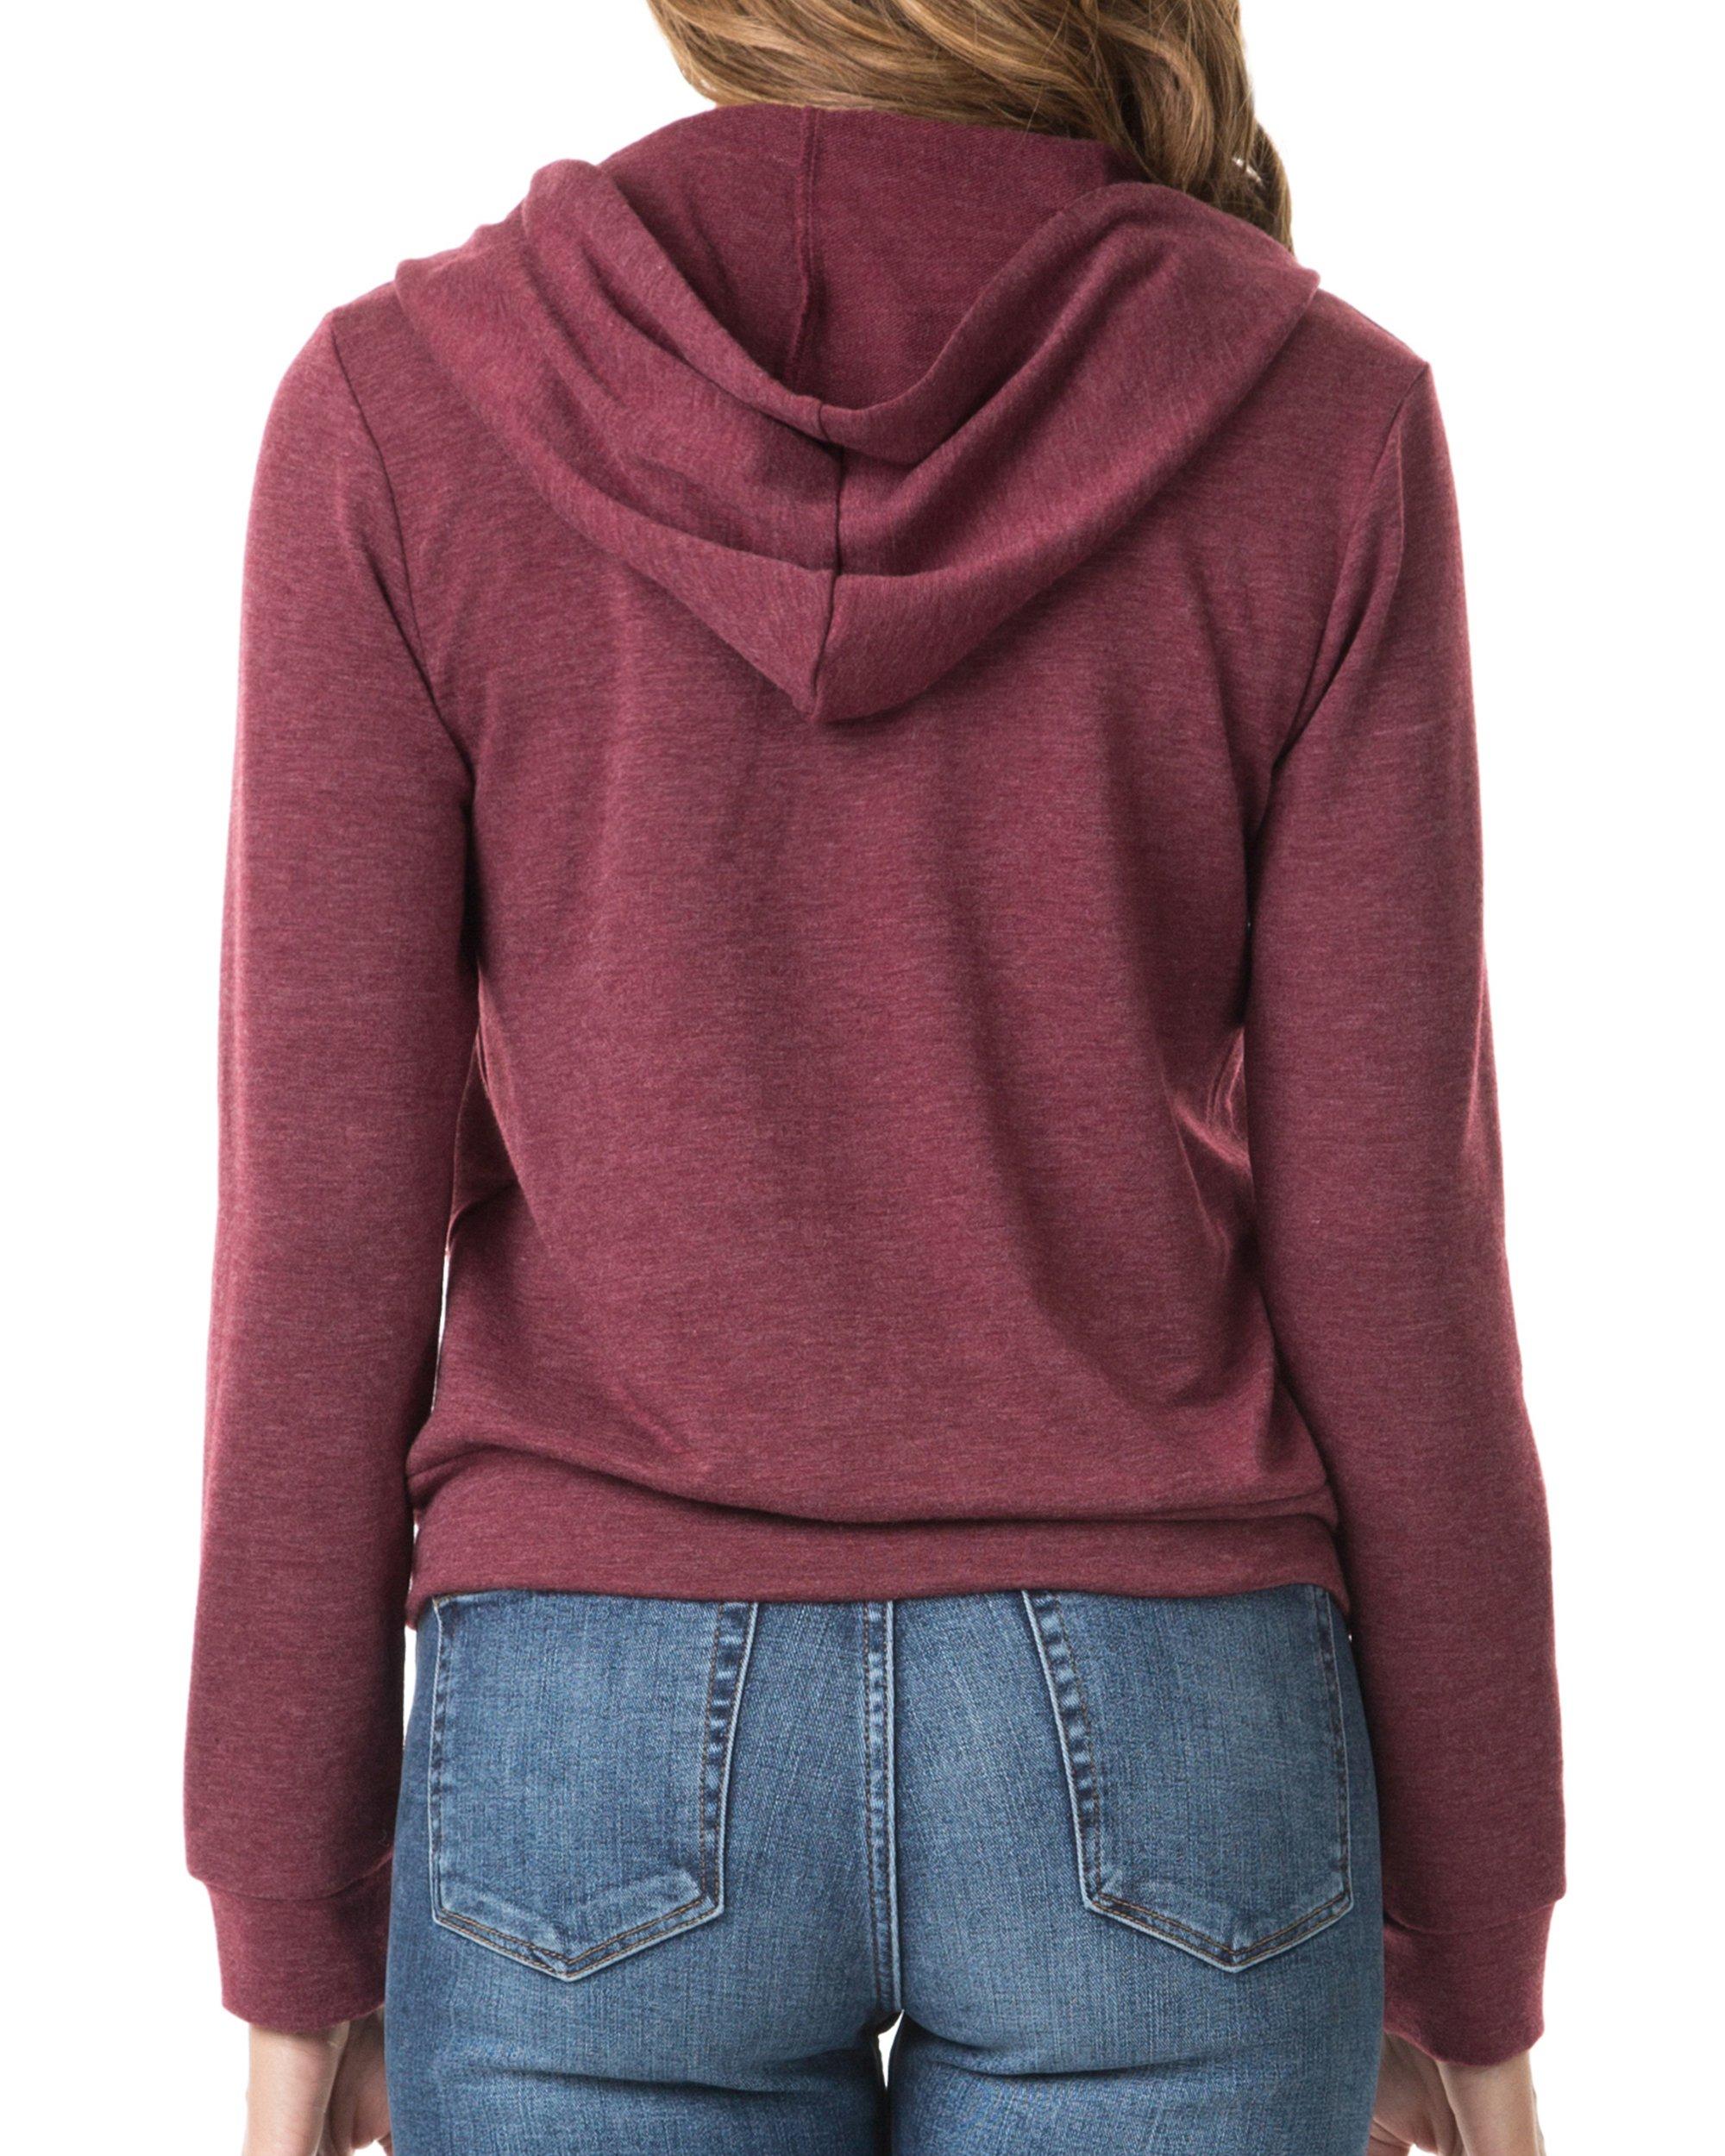 Nolabel B7_032 Women's Long Sleeve French Terry Drawstring Hoodies Zip Up Sweatshirt Hooded (Burgundy/5XL) by Nolabel (Image #3)